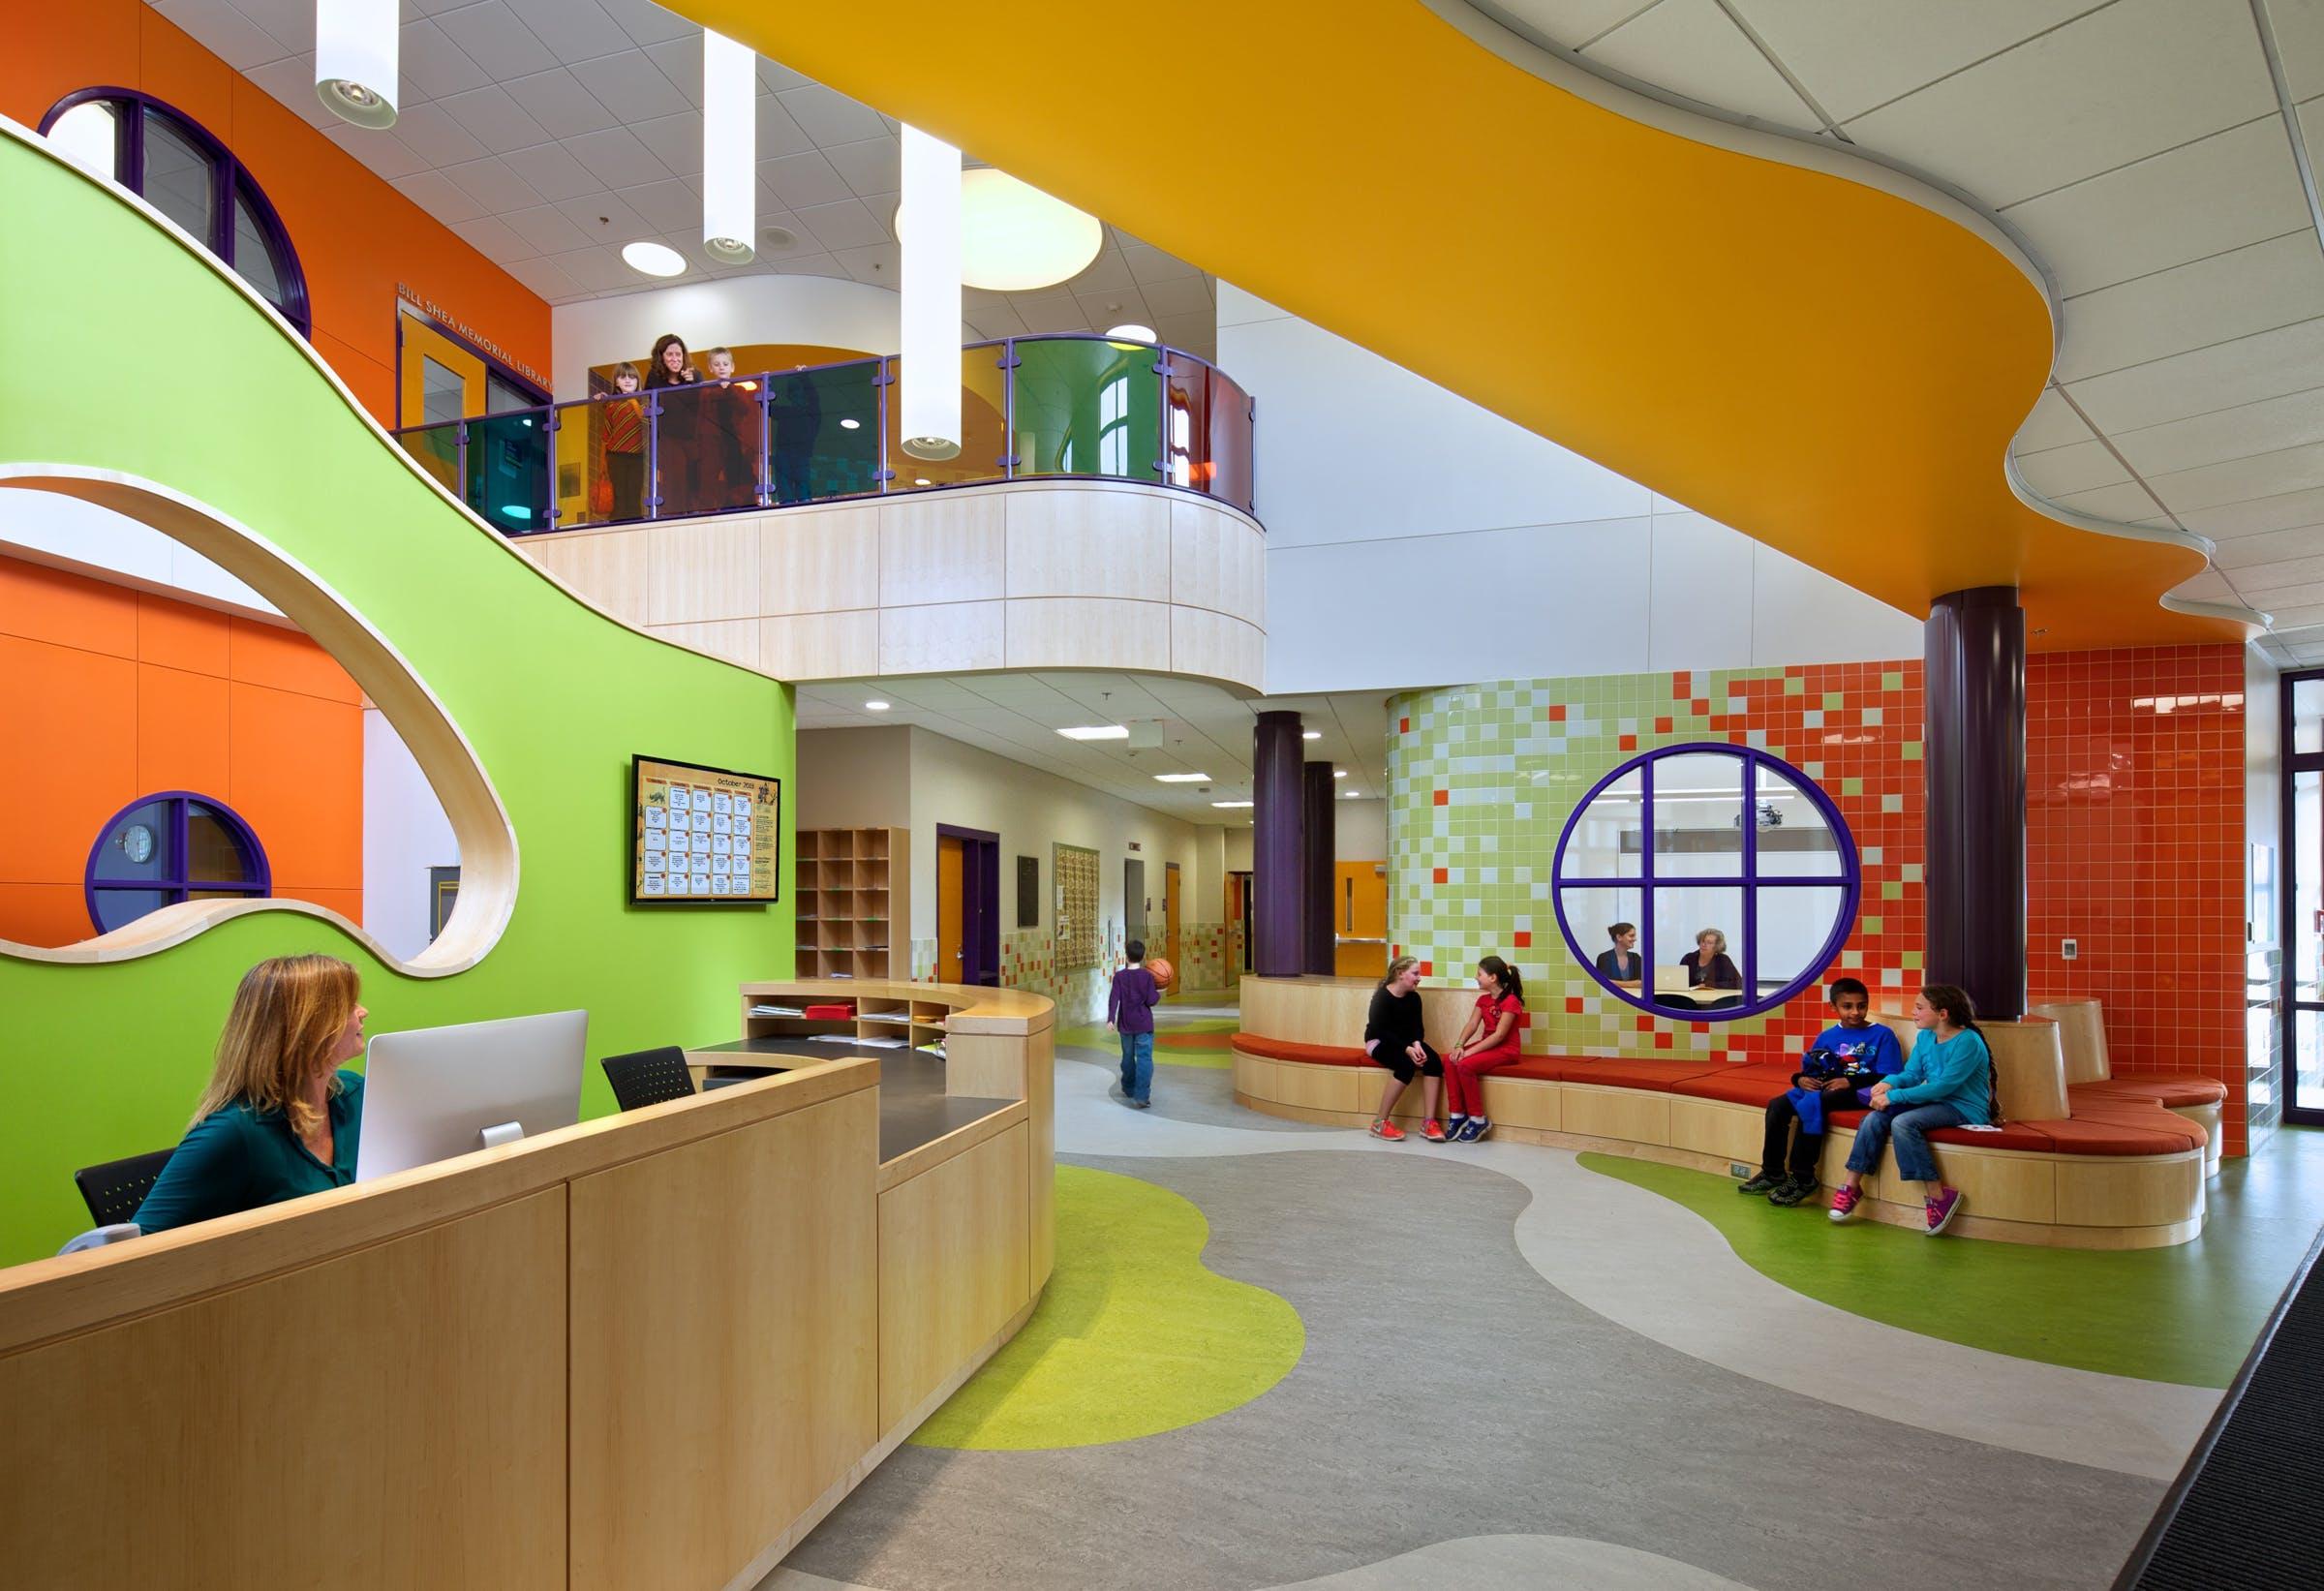 Thompson Elementary School Hmfh Architects Inc Archinect